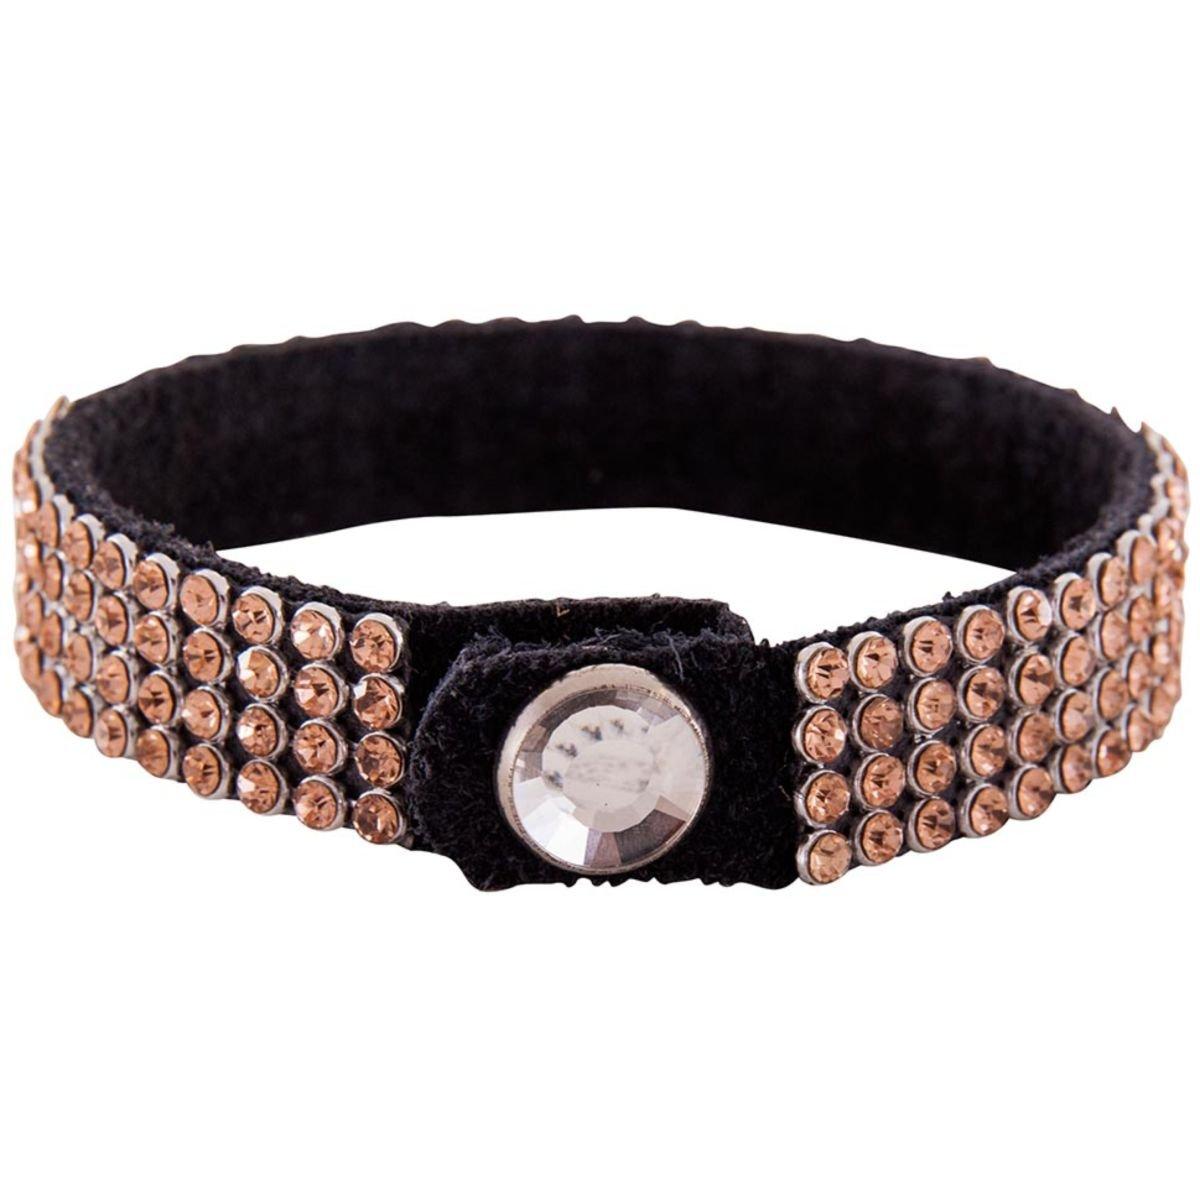 Afbeelding van BR Armband Crystallized met Rhinestone Button Perzik